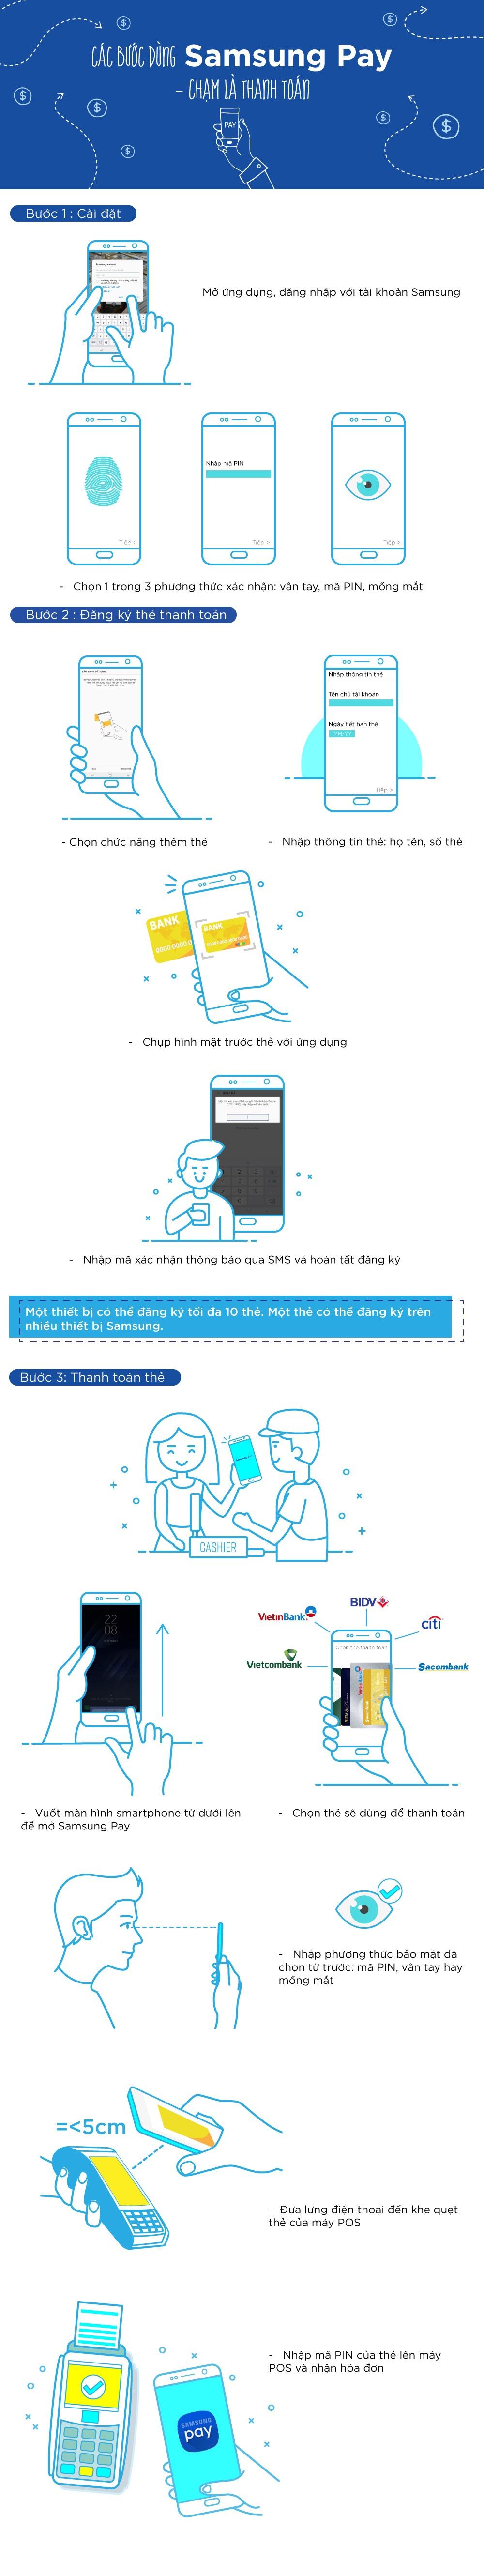 Cac buoc dung Samsung Pay hinh anh 1